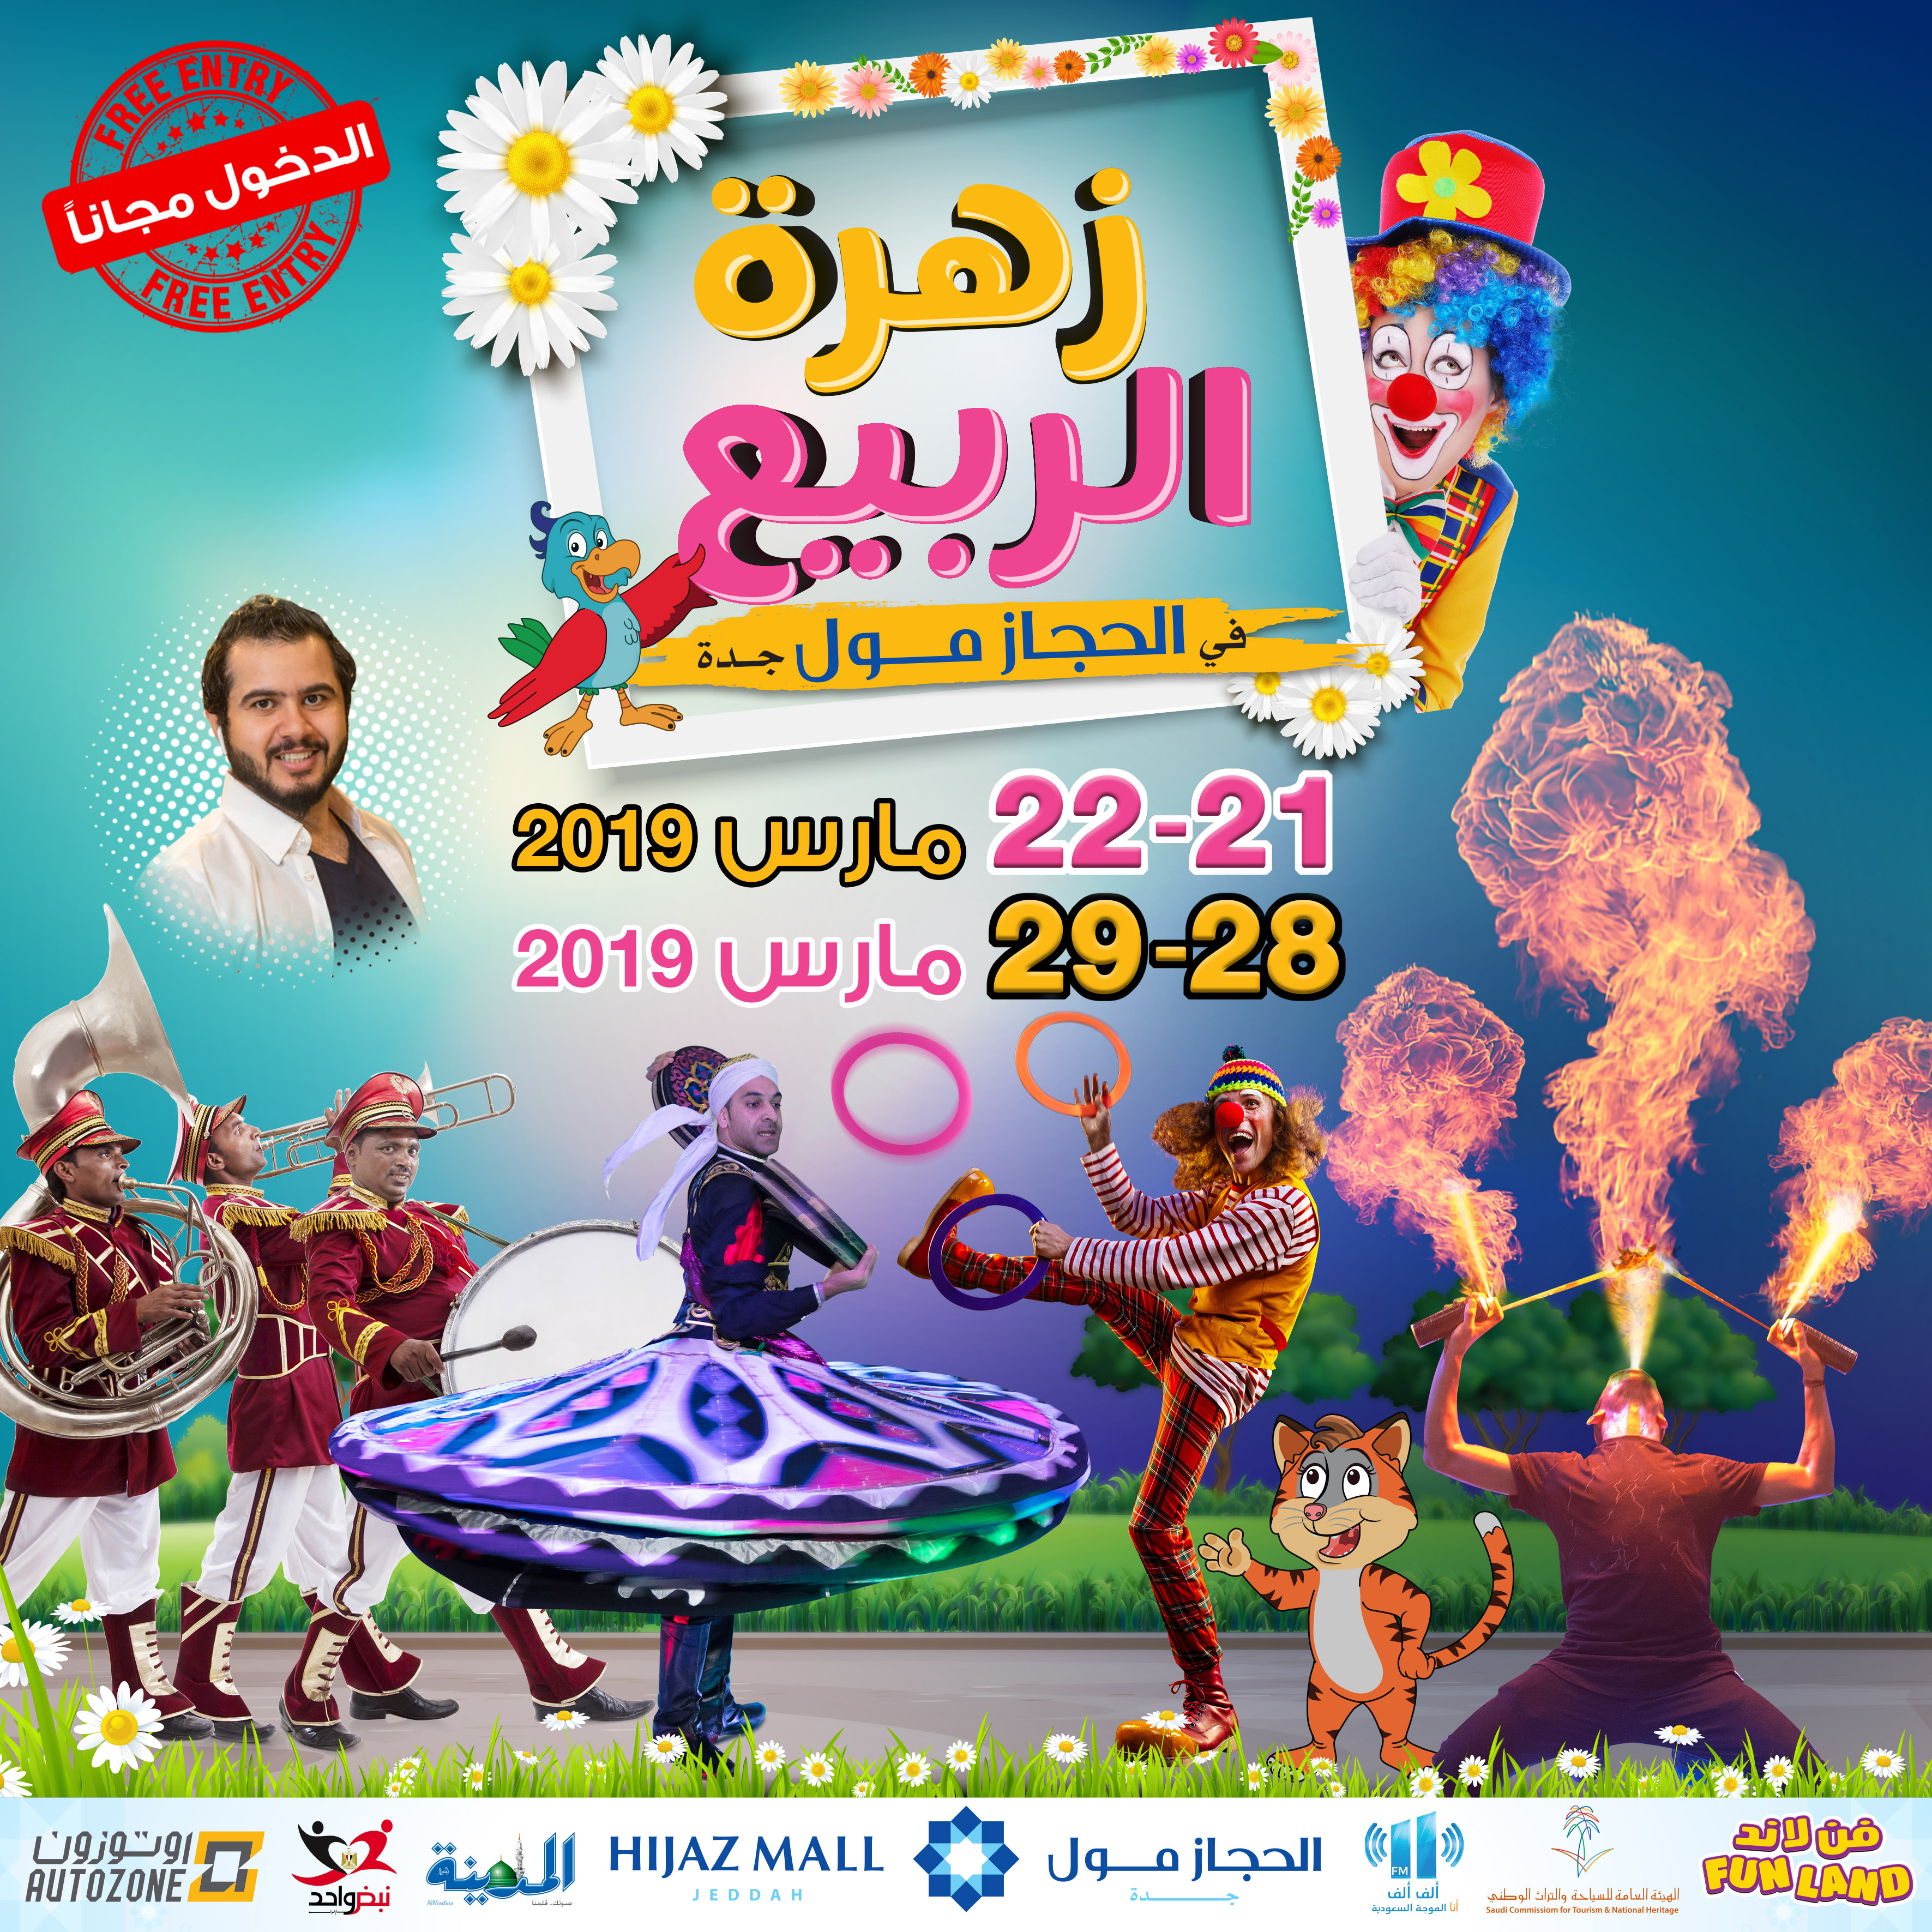 Spring Flower Event At Hijaz Mall Jeddah